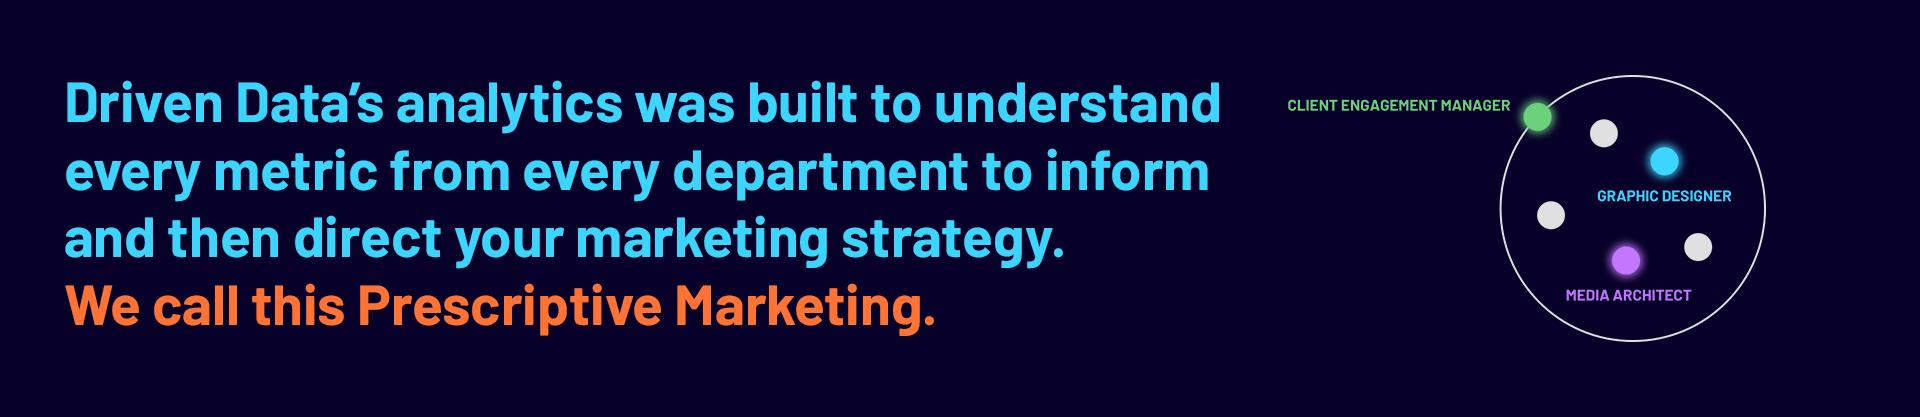 Prescriptive Marketing Team